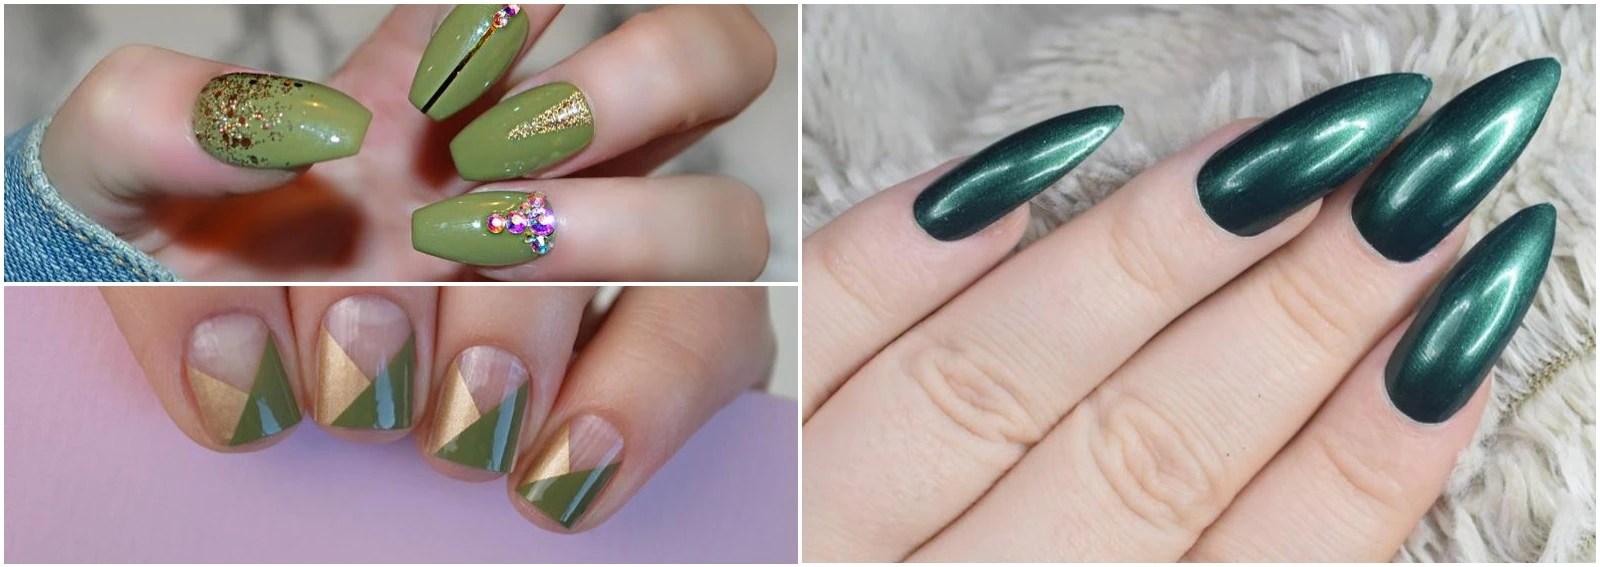 Nail Art Verde Le Idee Piu Belle A Cui Ispirarsi Per La Manicure